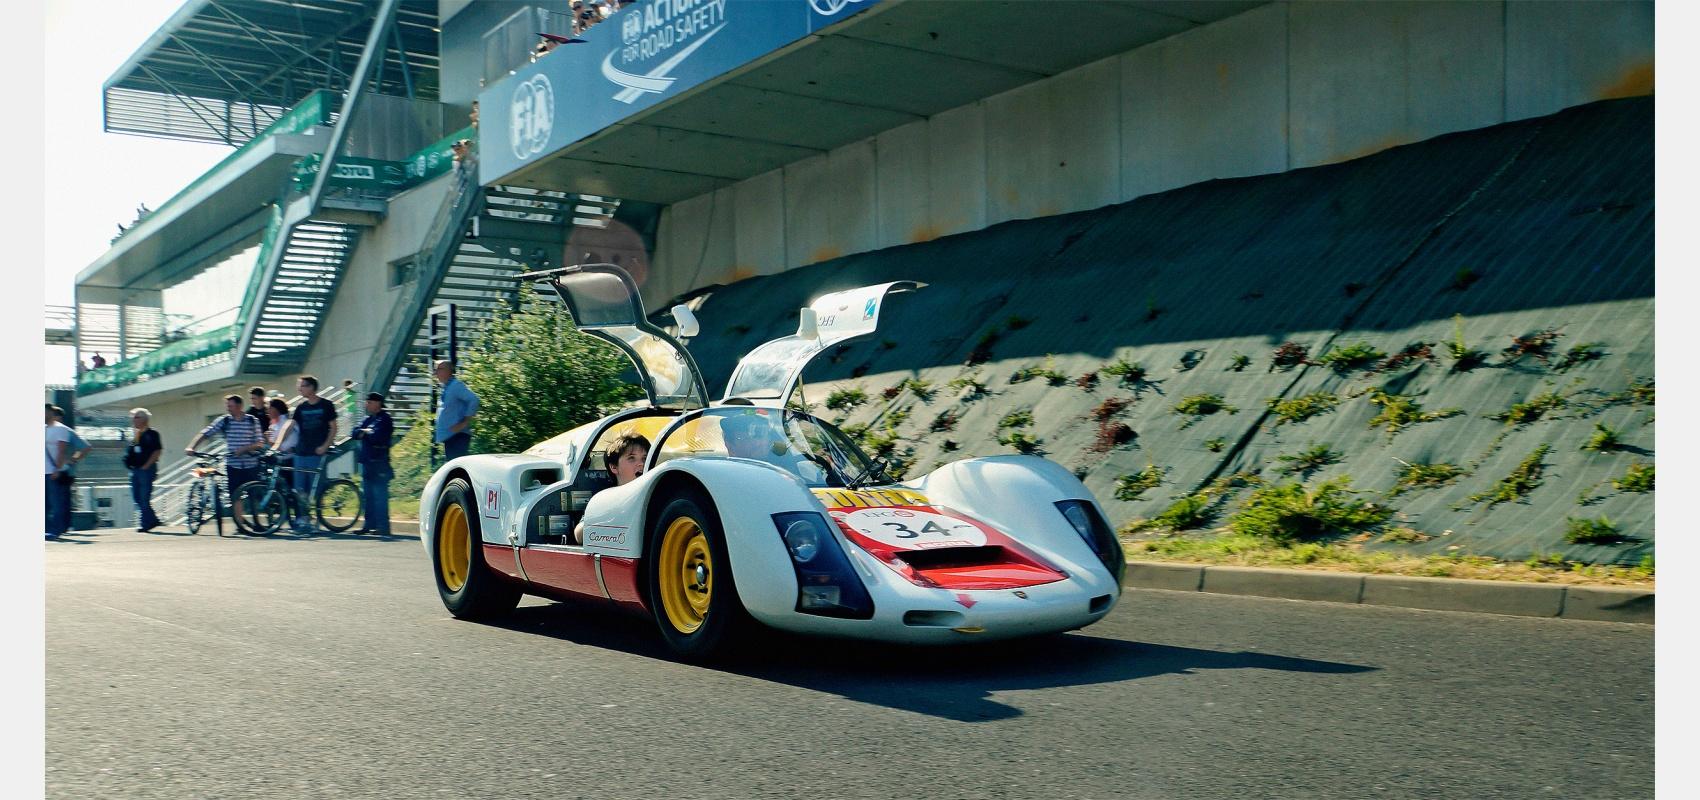 Motorsport, photography, Porsche, 906, Le Mans, Classic, young, boy, paddock.